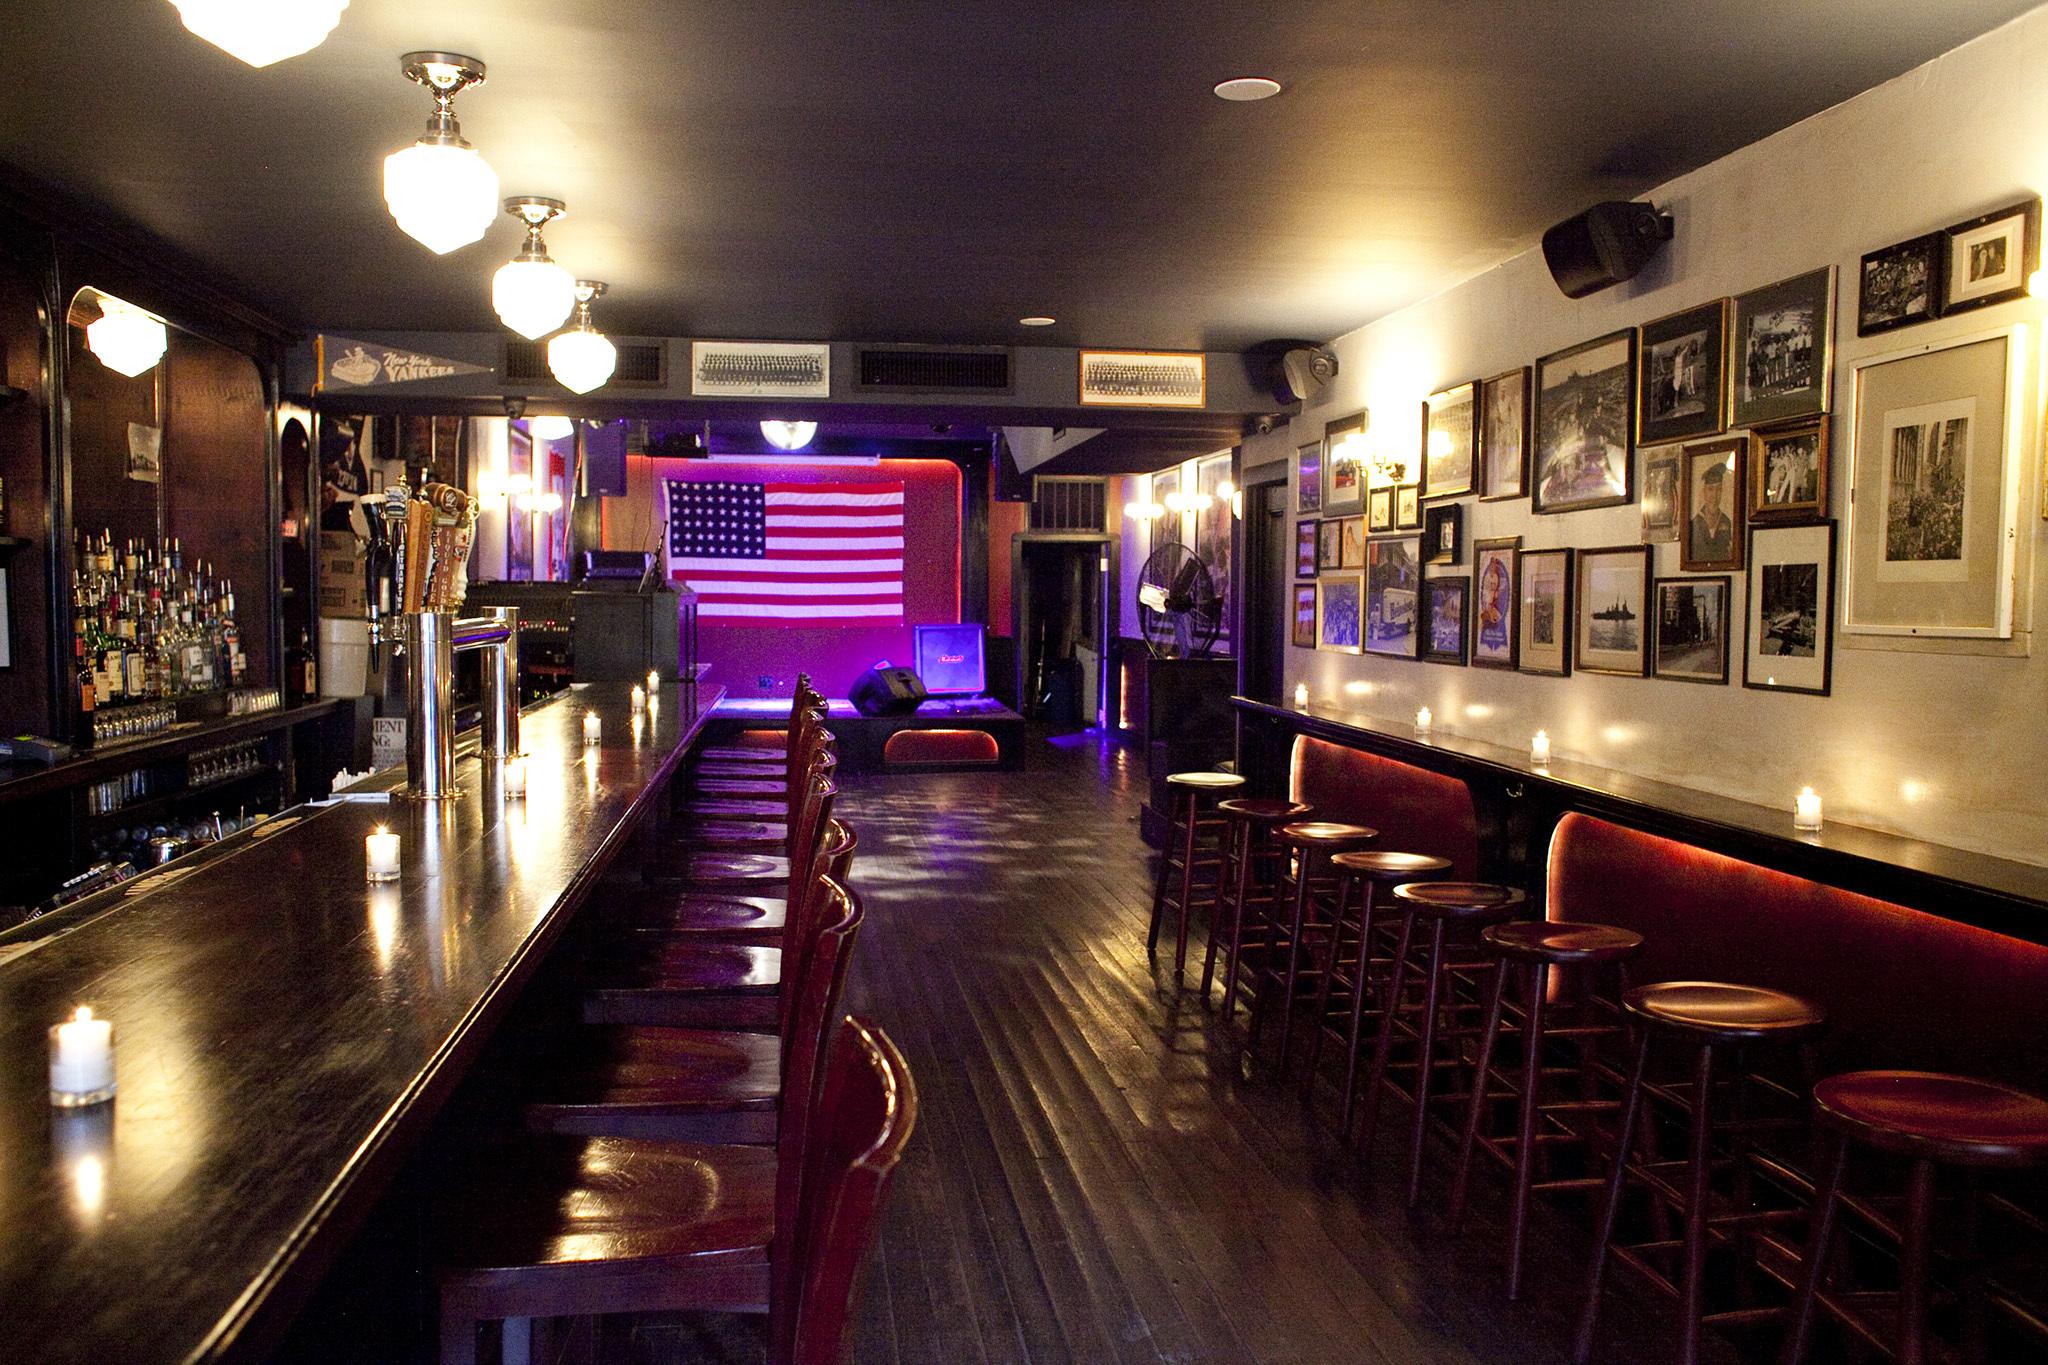 Williamsburg bars near the Brooklyn Flea market